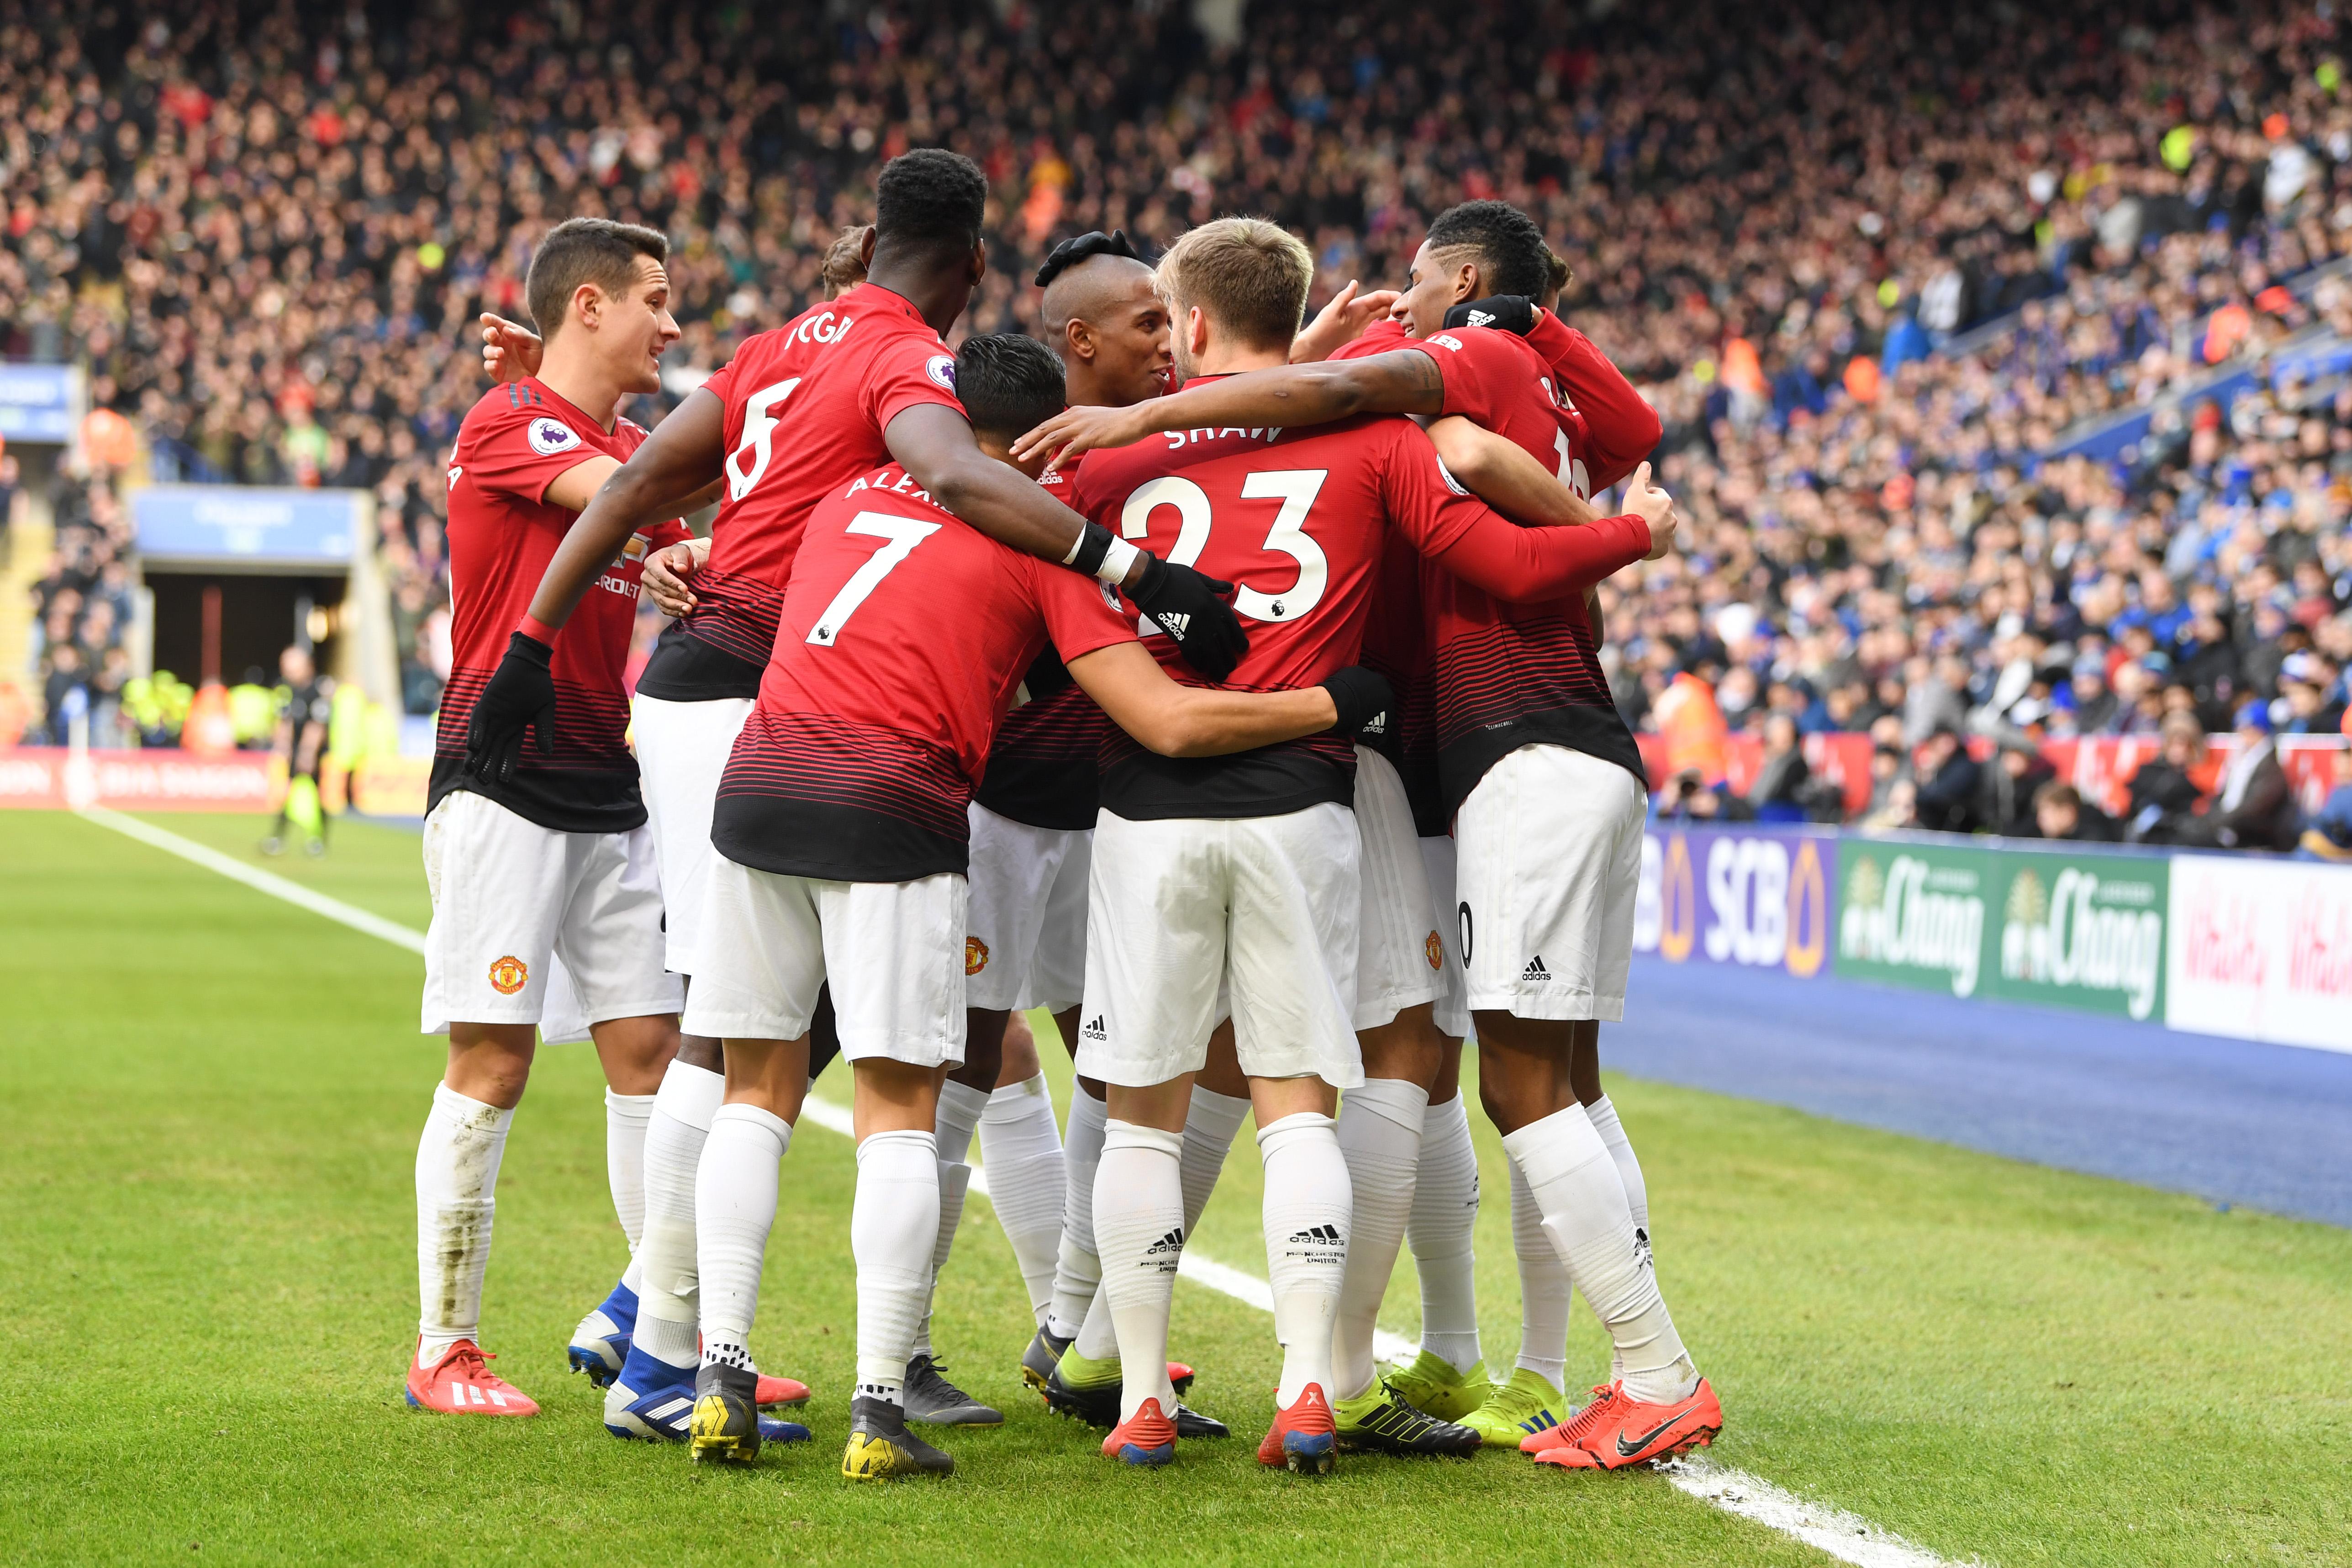 Berita Manchester United Bursa Transfer Manchester United